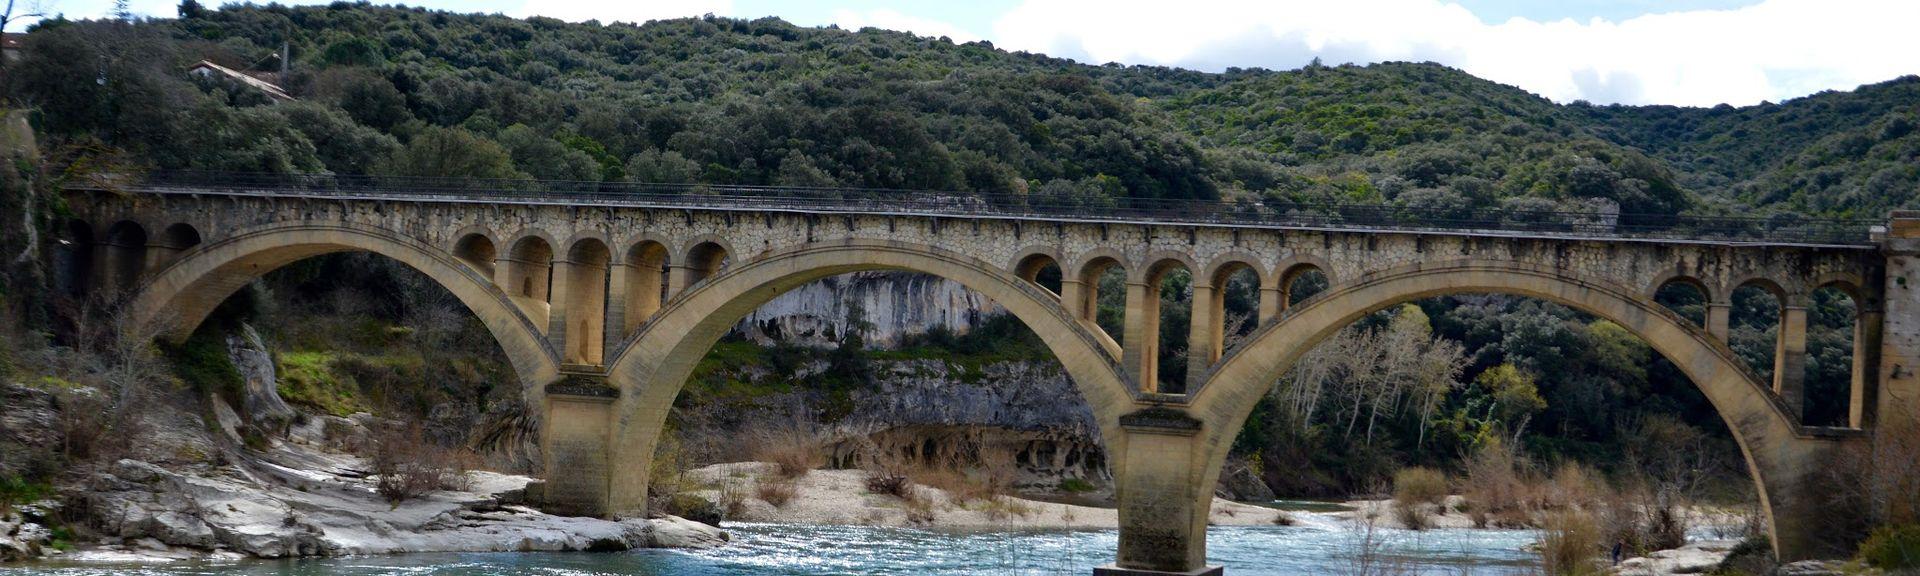 Saint-Jean-de-Ceyrargues, Gard, France